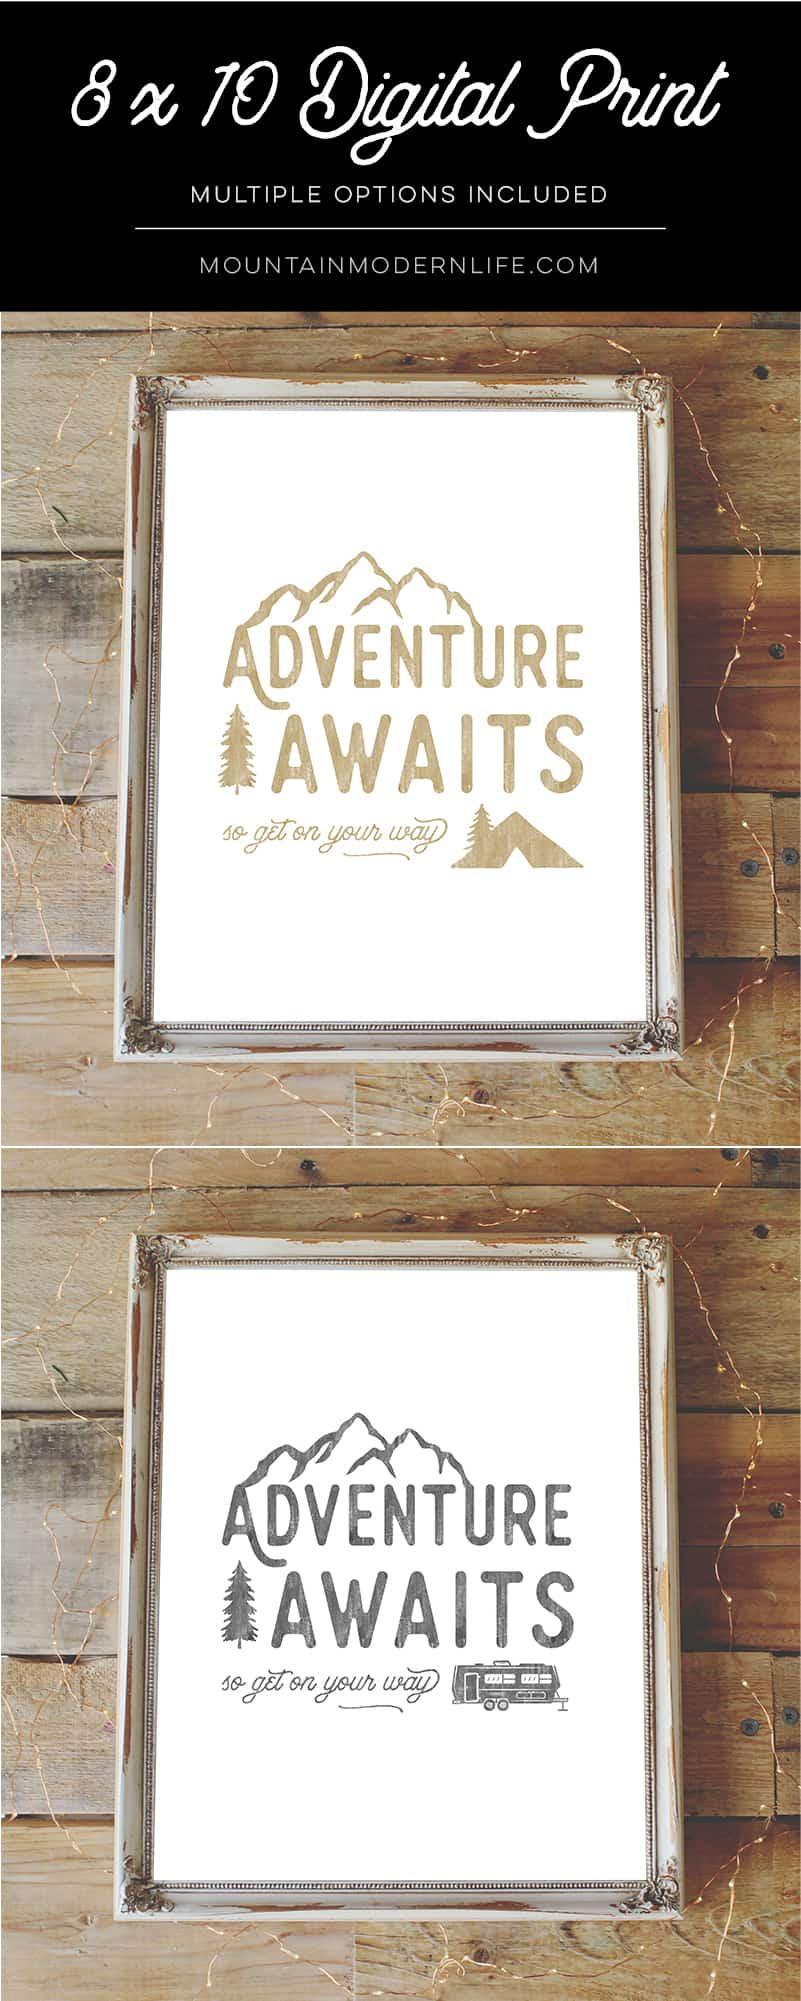 Adventure Awaits Printable   MountainModernLife.com